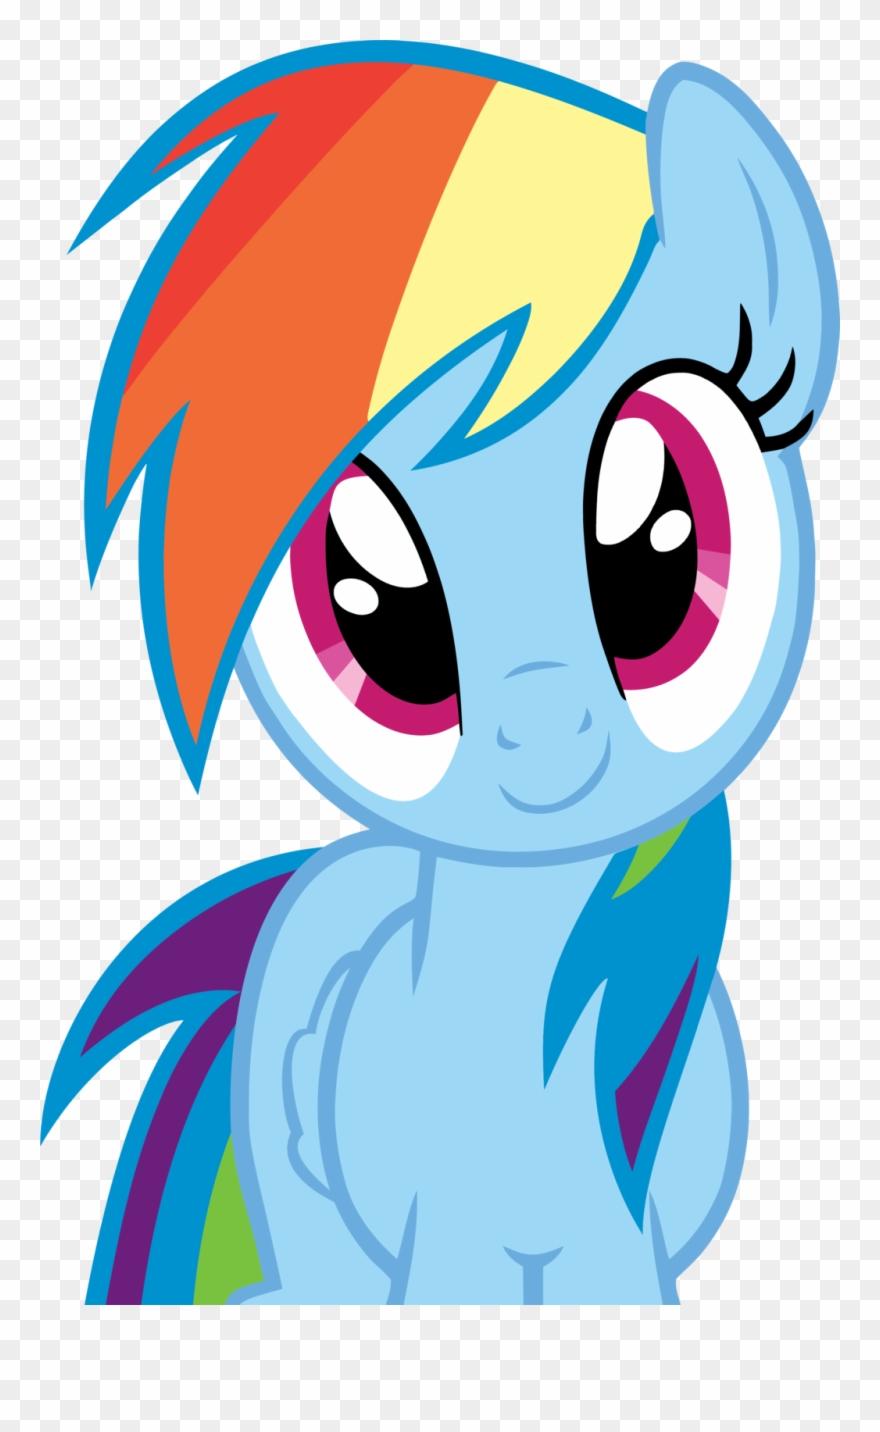 - Rainbow Dash Innocent Smile By Rontoday - My Little Pony Rainbow